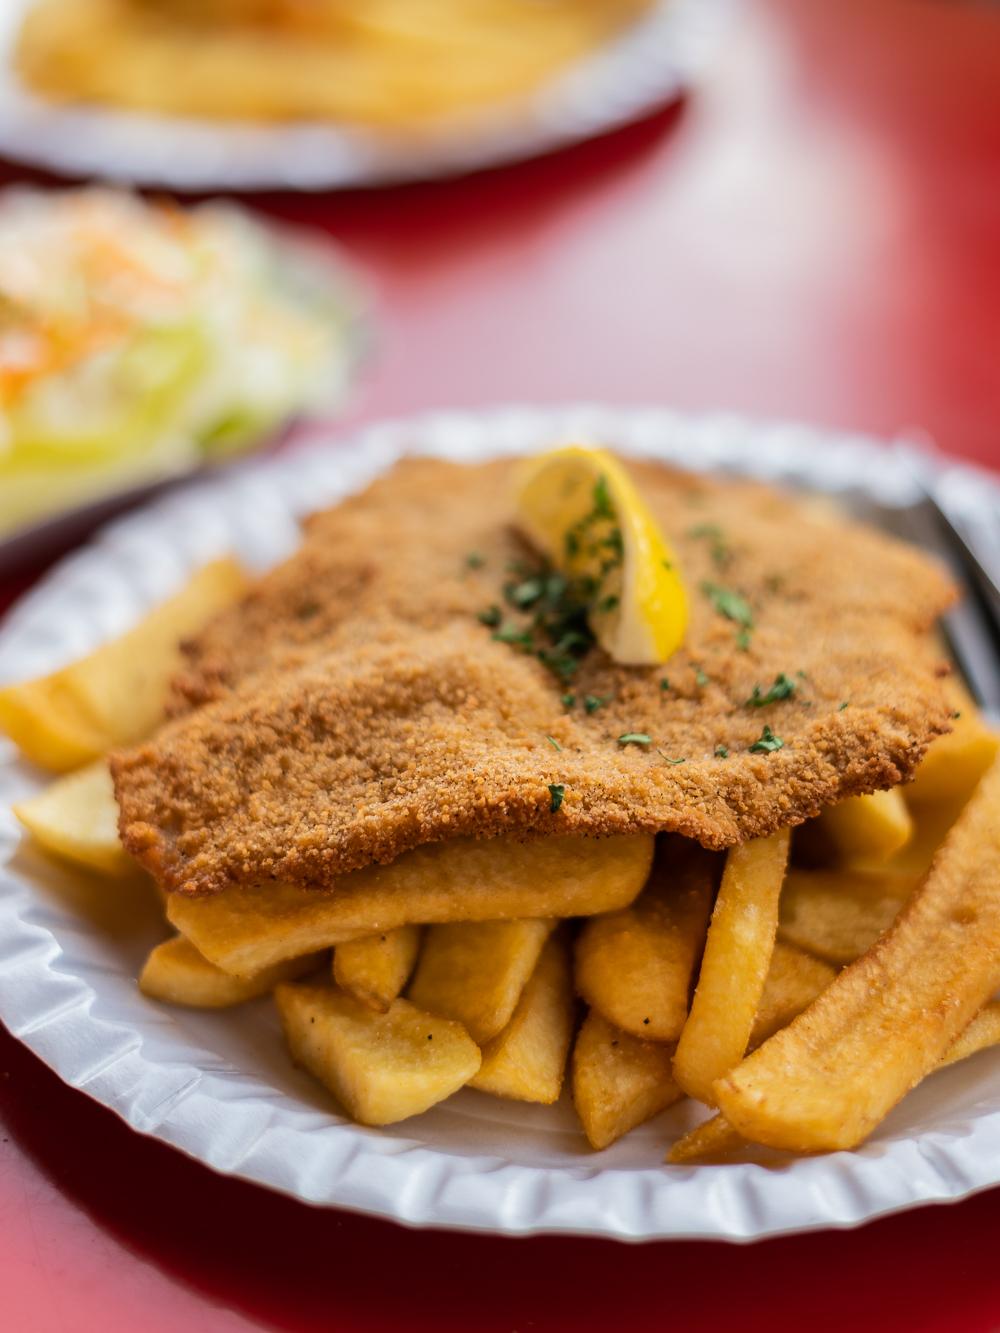 Günstiger und lecker essen in Berlin-Restaurant Tipps Berlin-Fast Food Berlin-Scheers Schnitzel-German Food-andysparkles